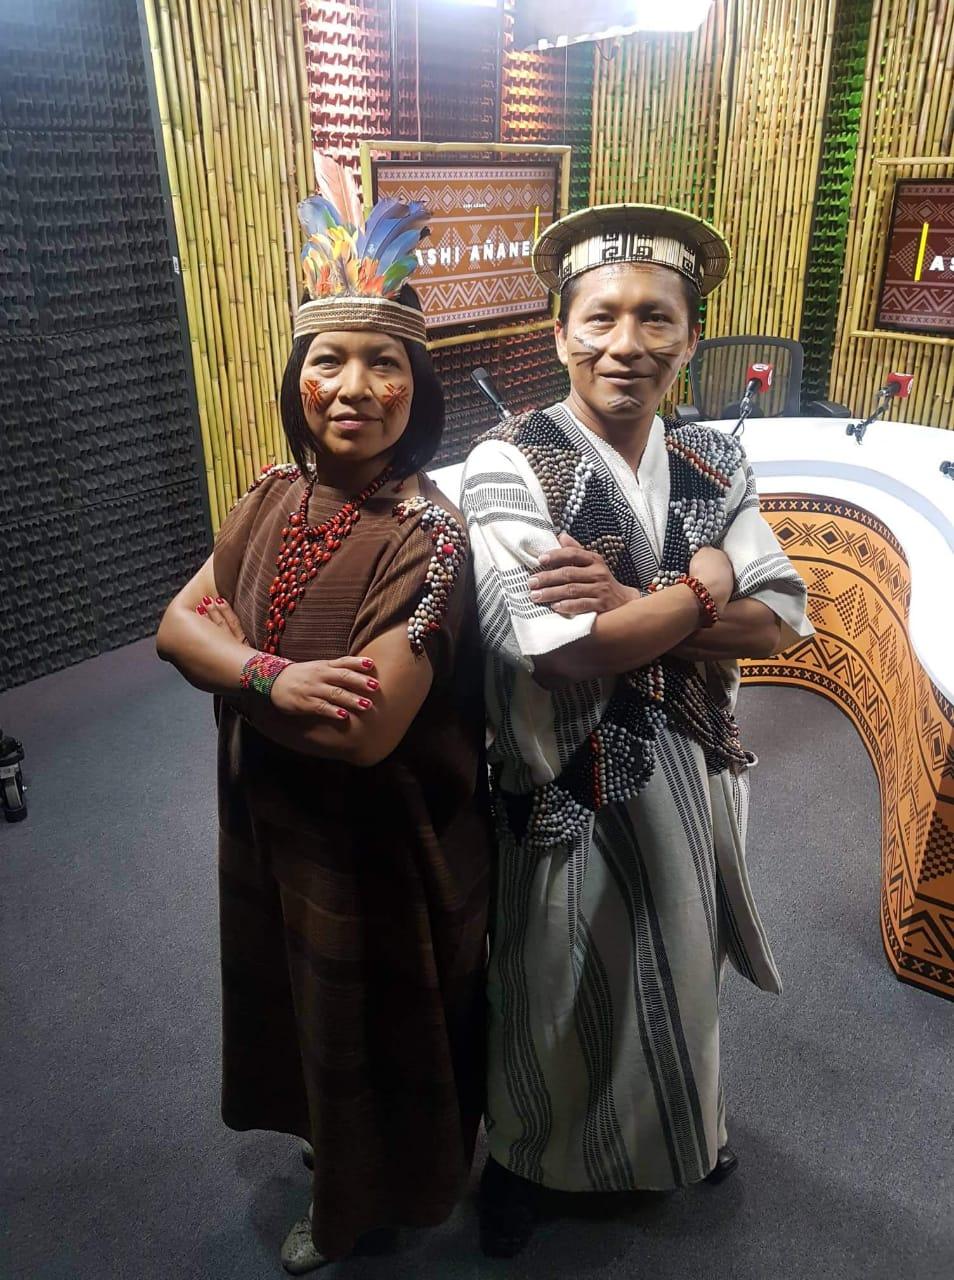 Hosts of Ashi Añane